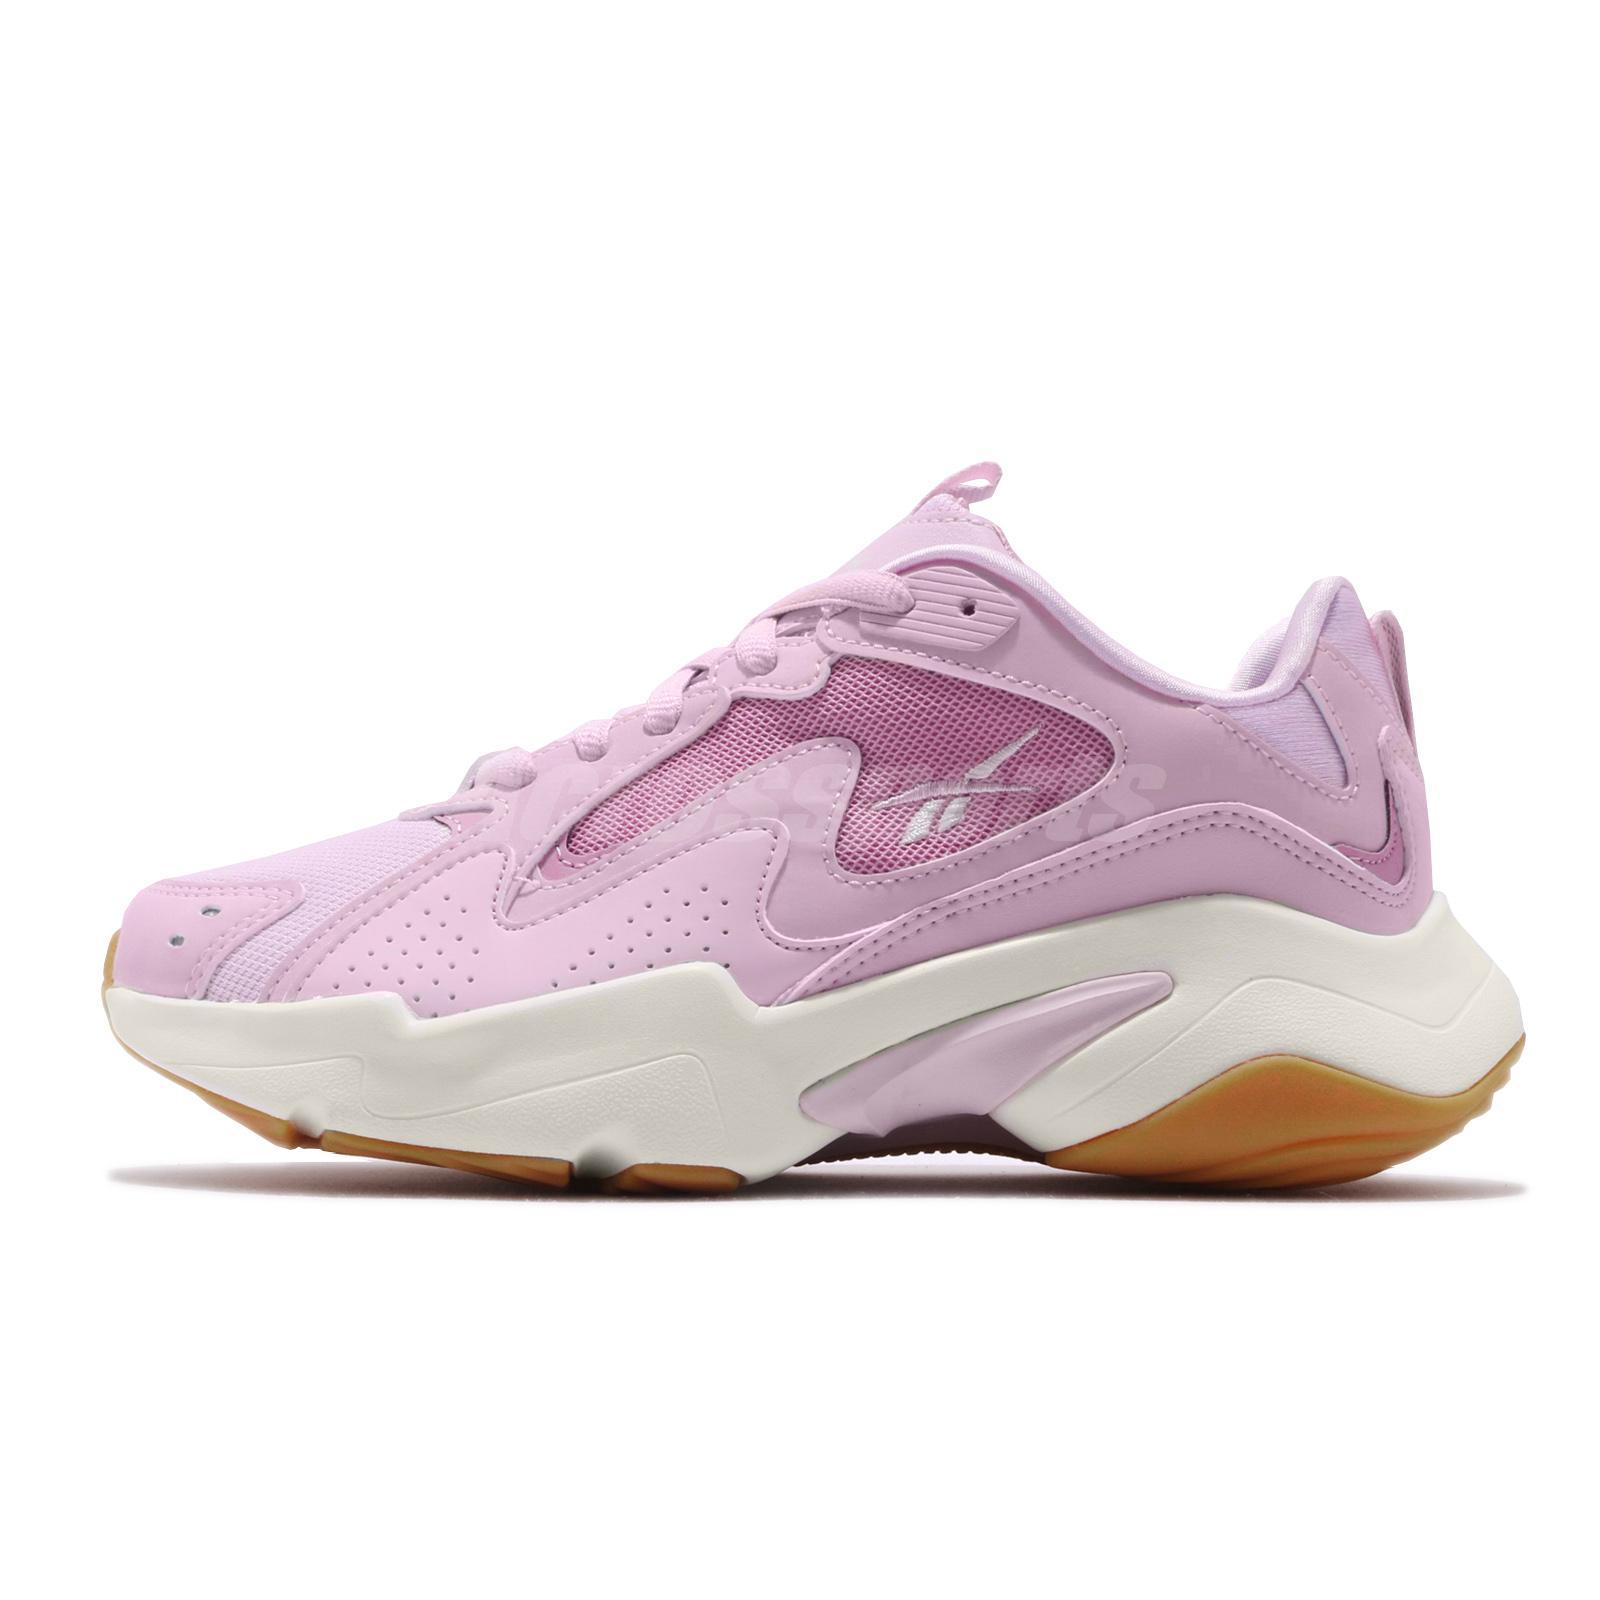 Reebok Royal Turbo Impuls Pix Pink Chalk Gum Women Running Shoes Sneakers EH3467